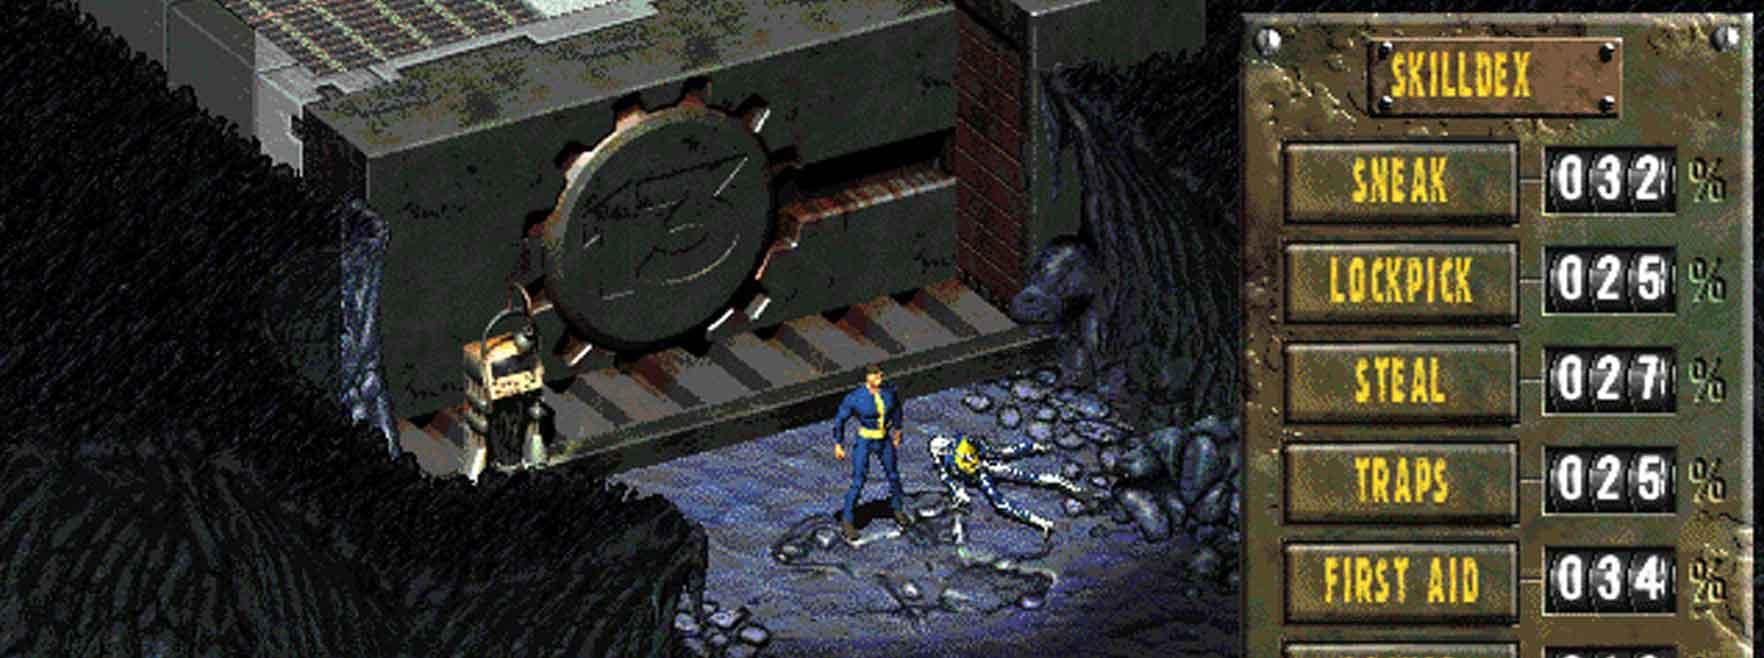 Fanowi Fallouta 1 uda³o siê uruchomiæ go na smartfonie